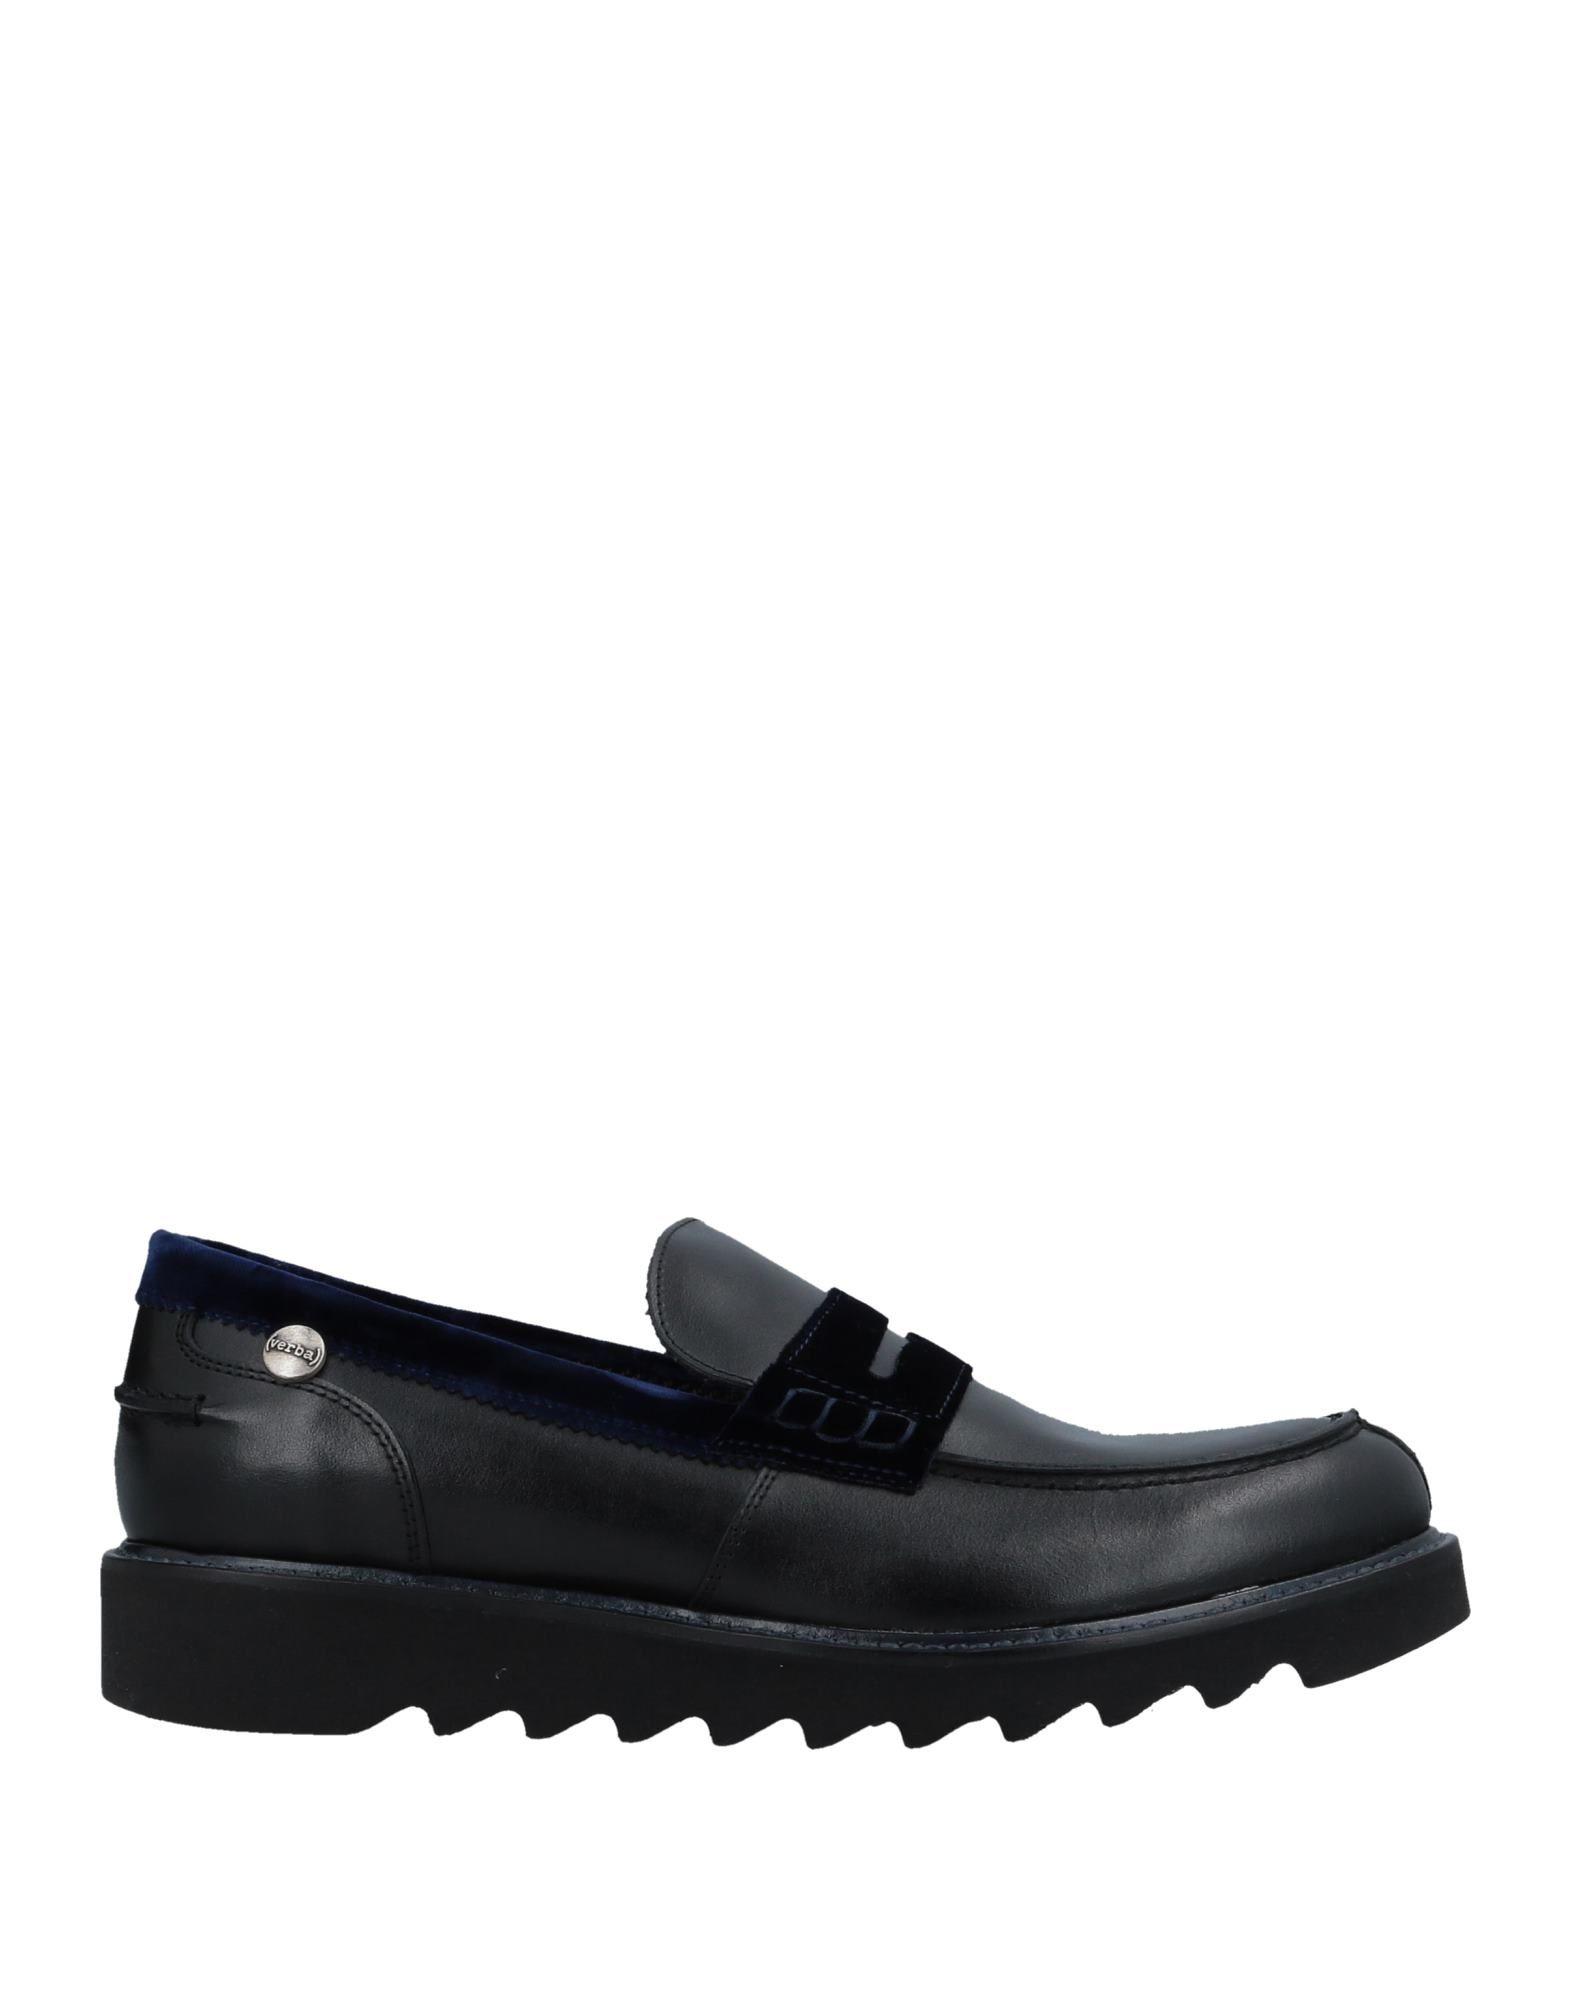 Rabatt echte Schuhe ( Verba ) Mokassins Herren  11510451JR